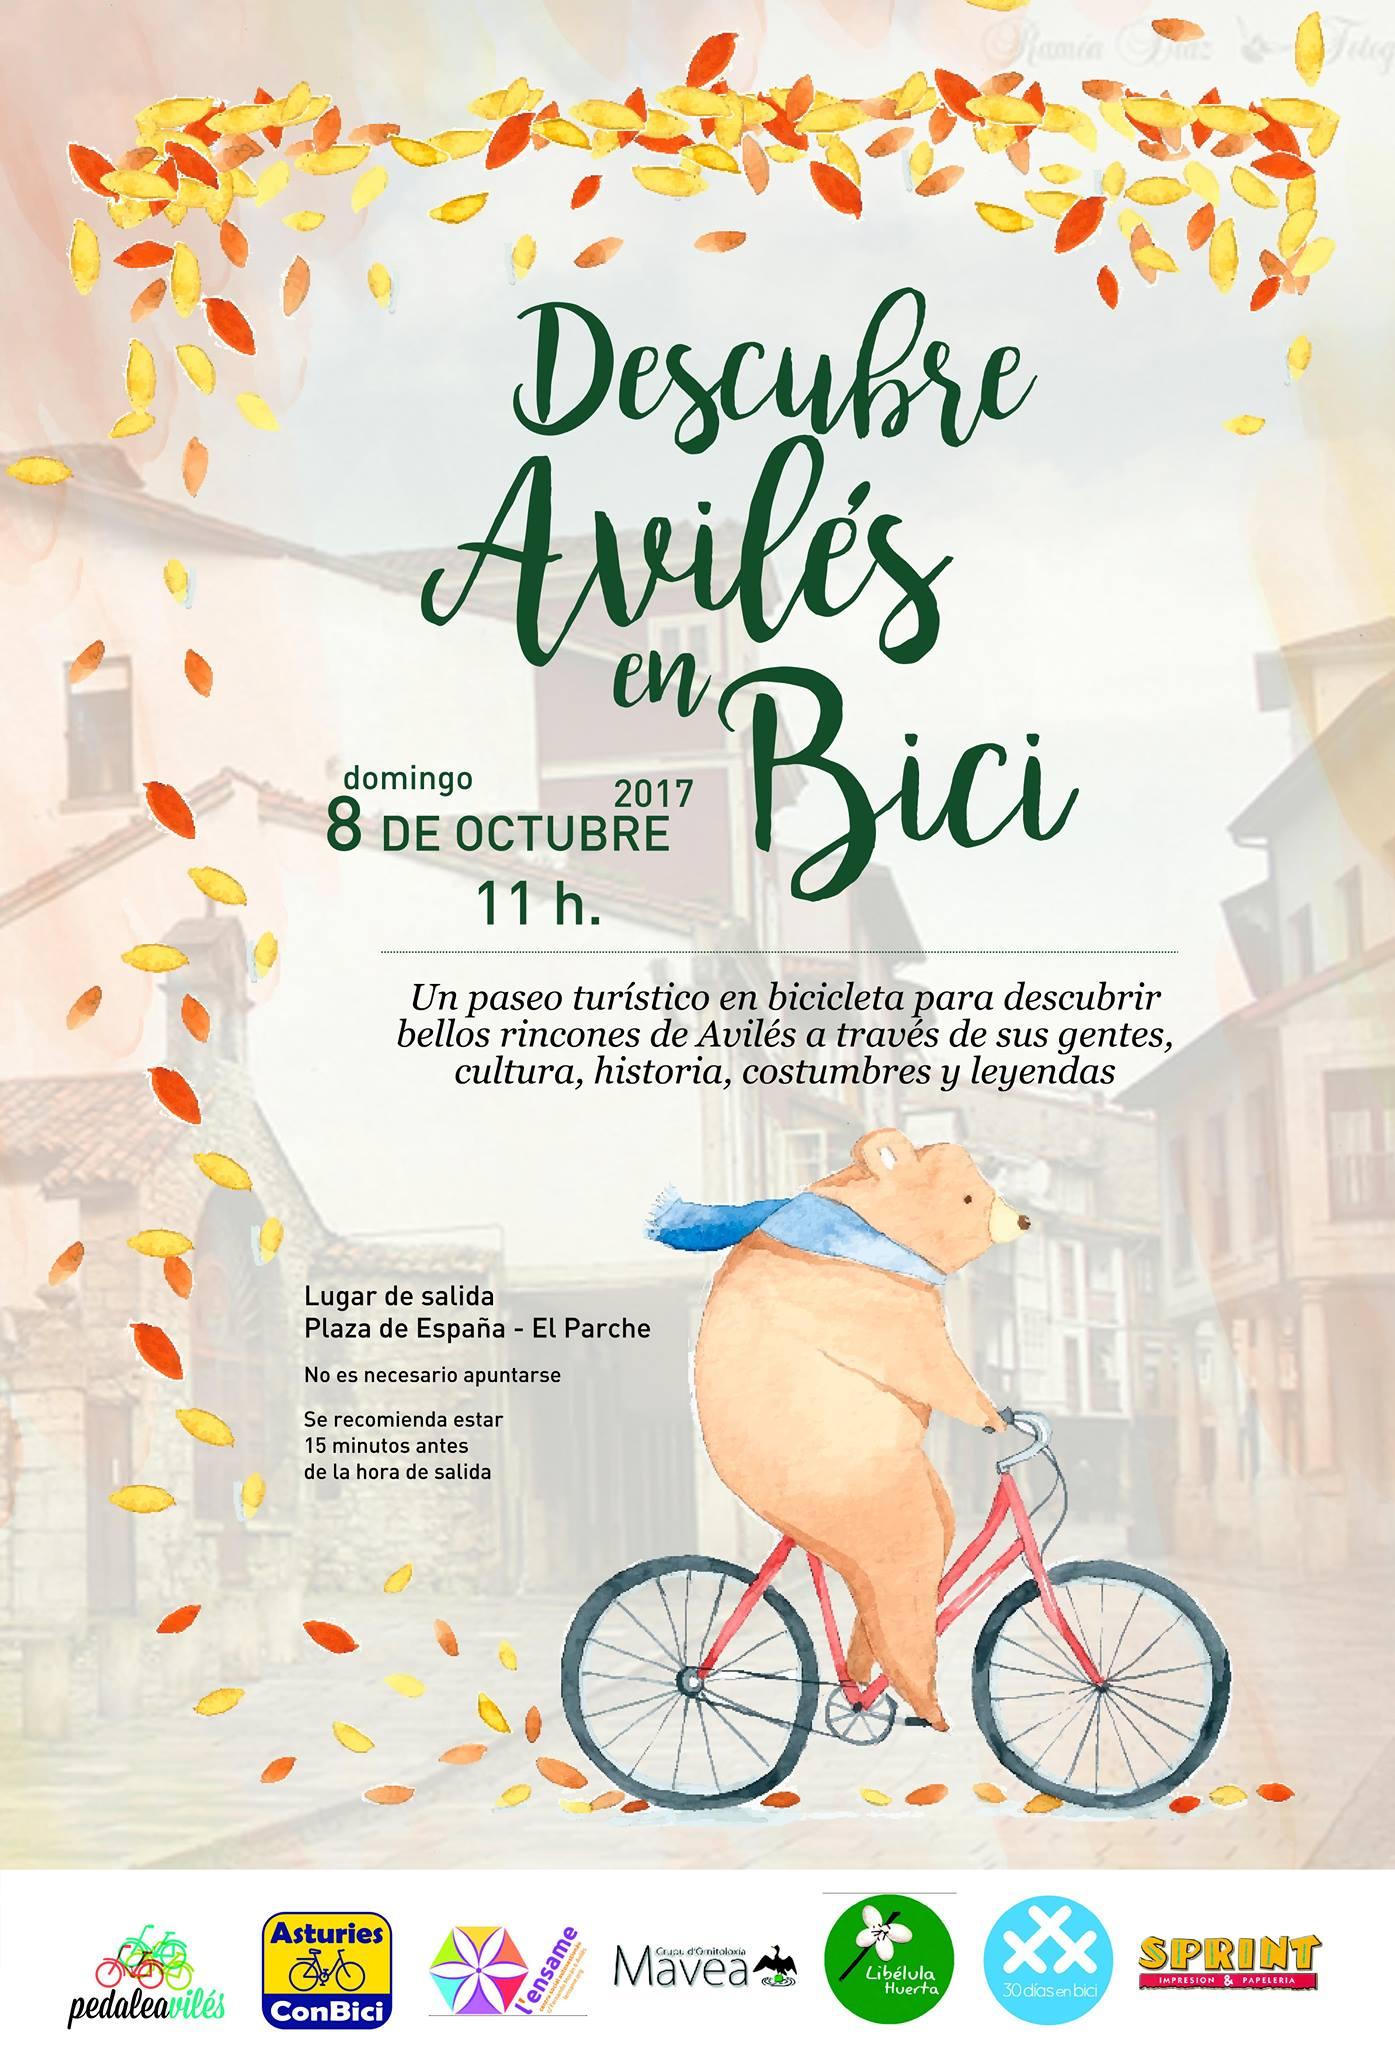 cartel-descubre-aviles-en-bici-octubre2017.jpg